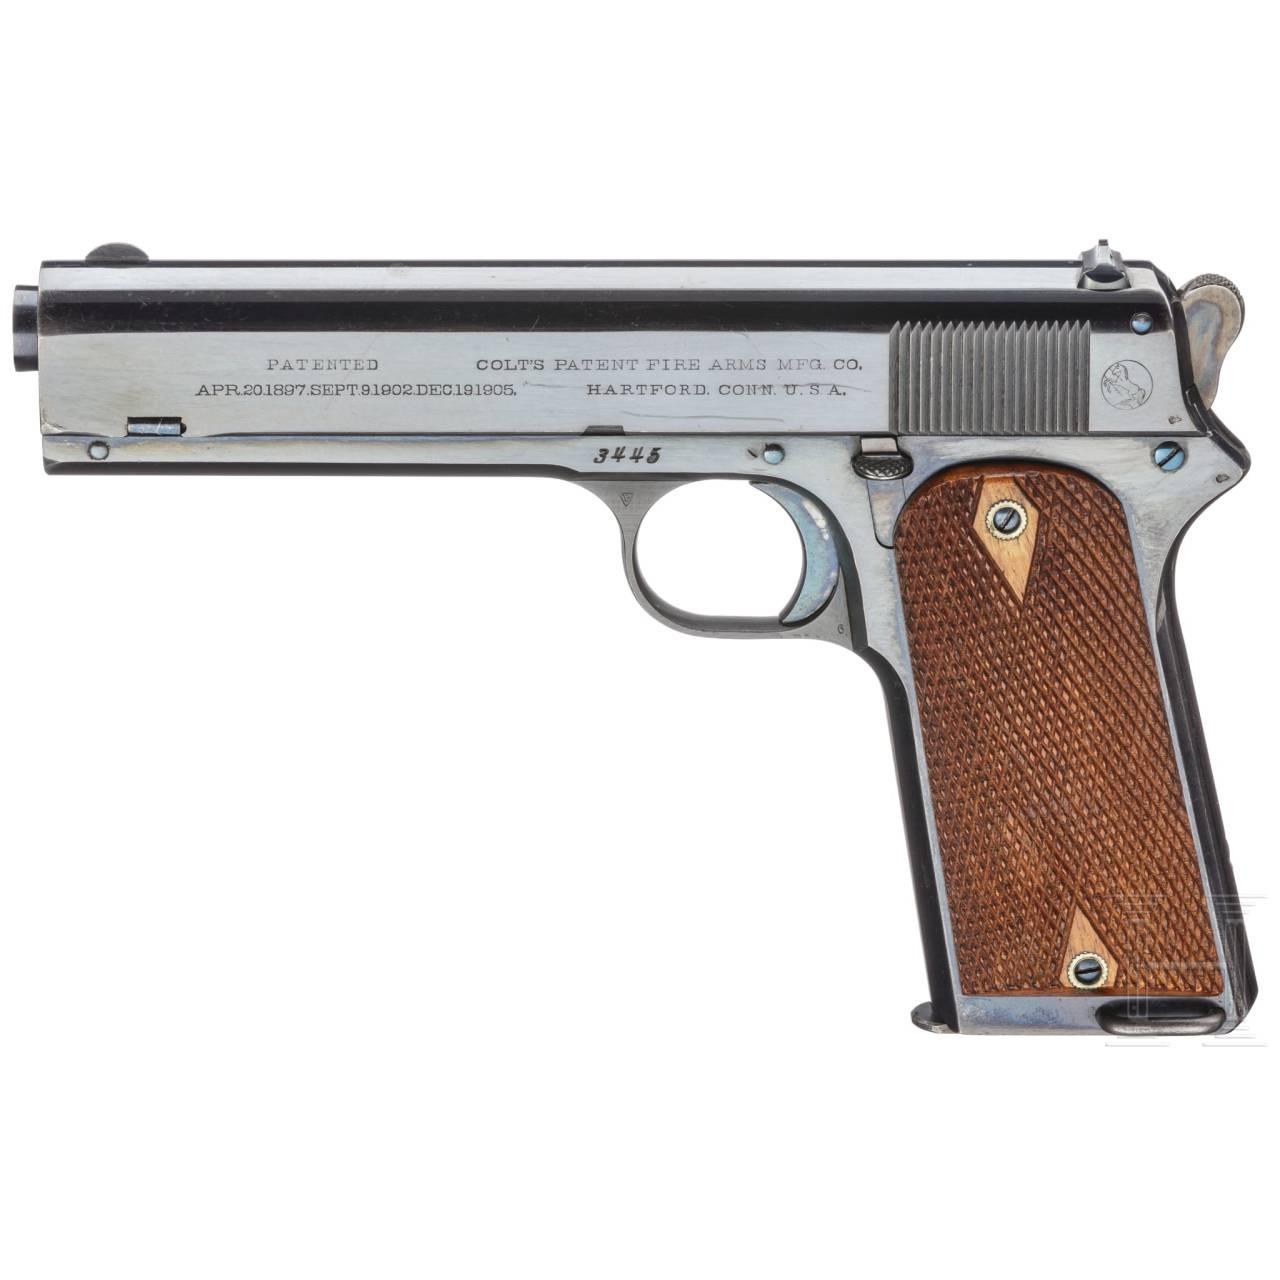 Colt Model 1905 .45 Automatic Pistol, British Contract